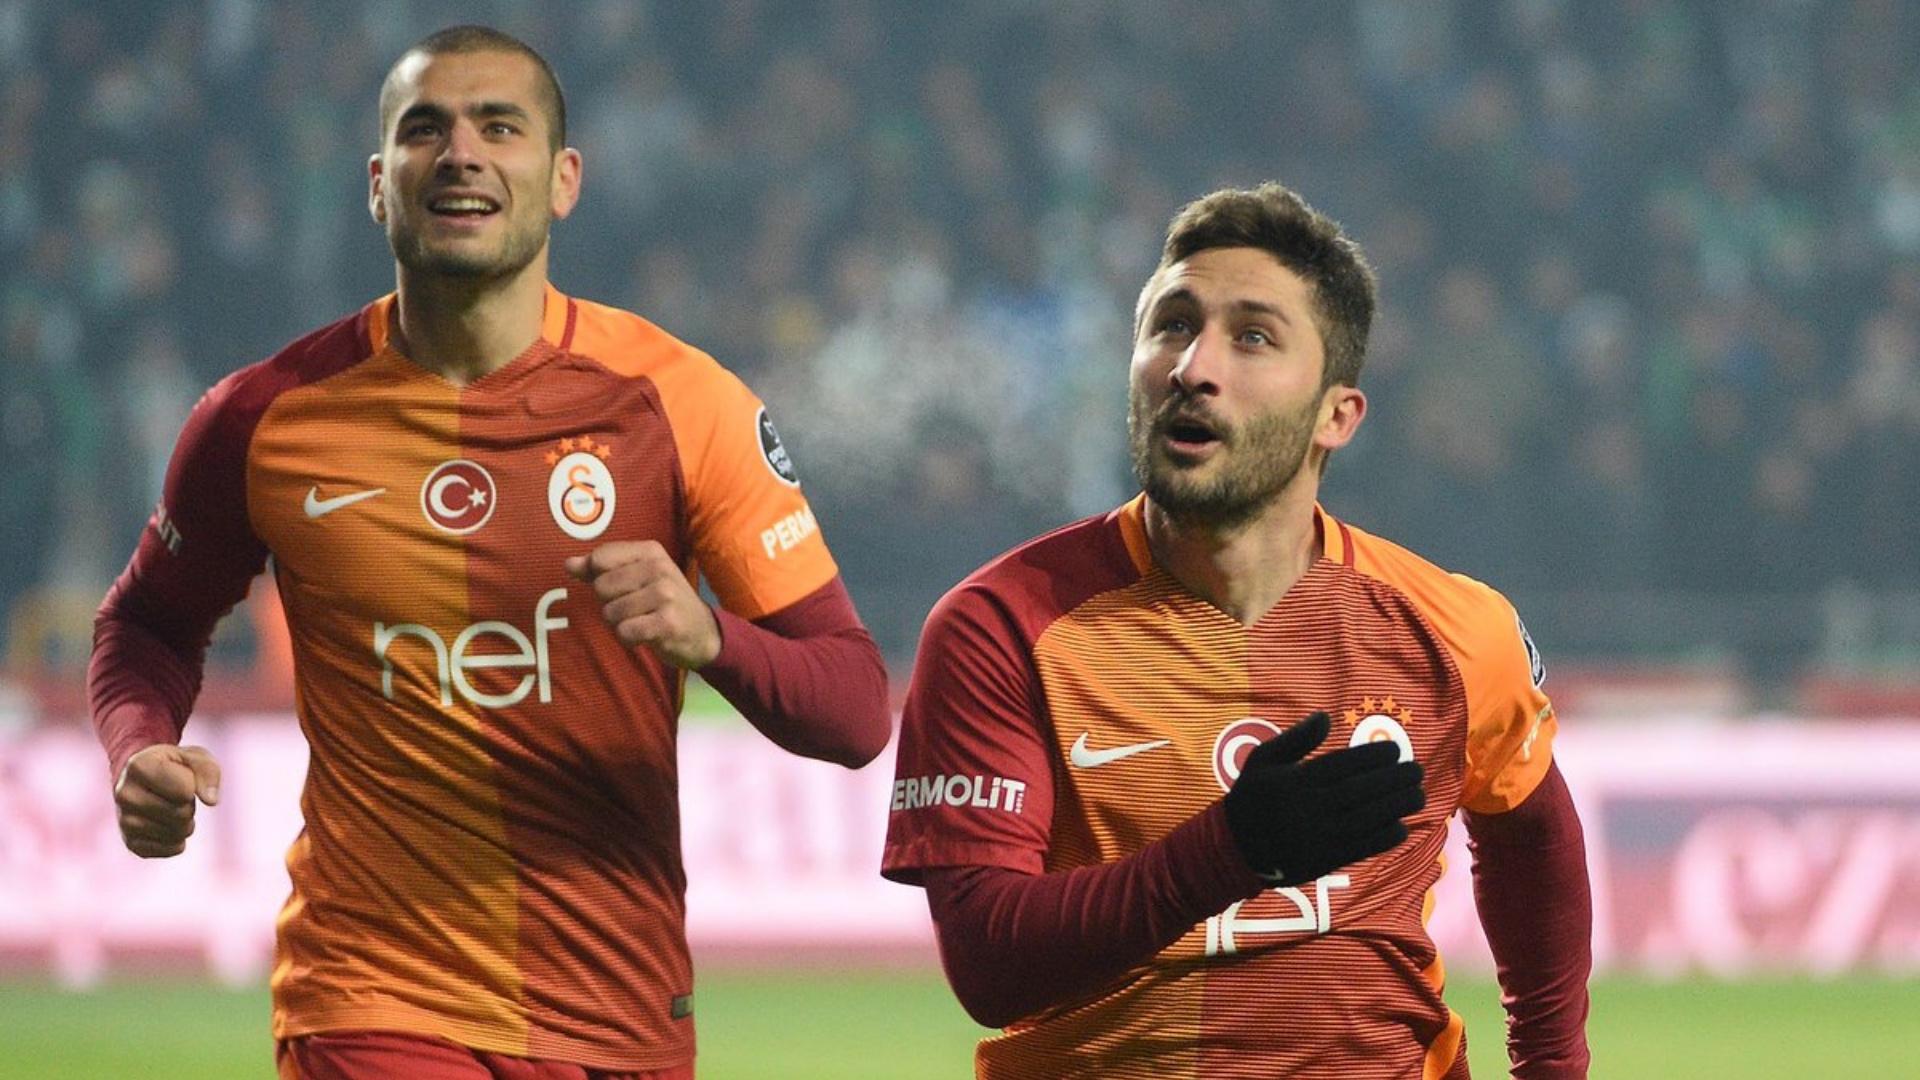 Konyaspor Galatasaray Eren Derdiyok Sabri Sarioglu 01142016 STSL